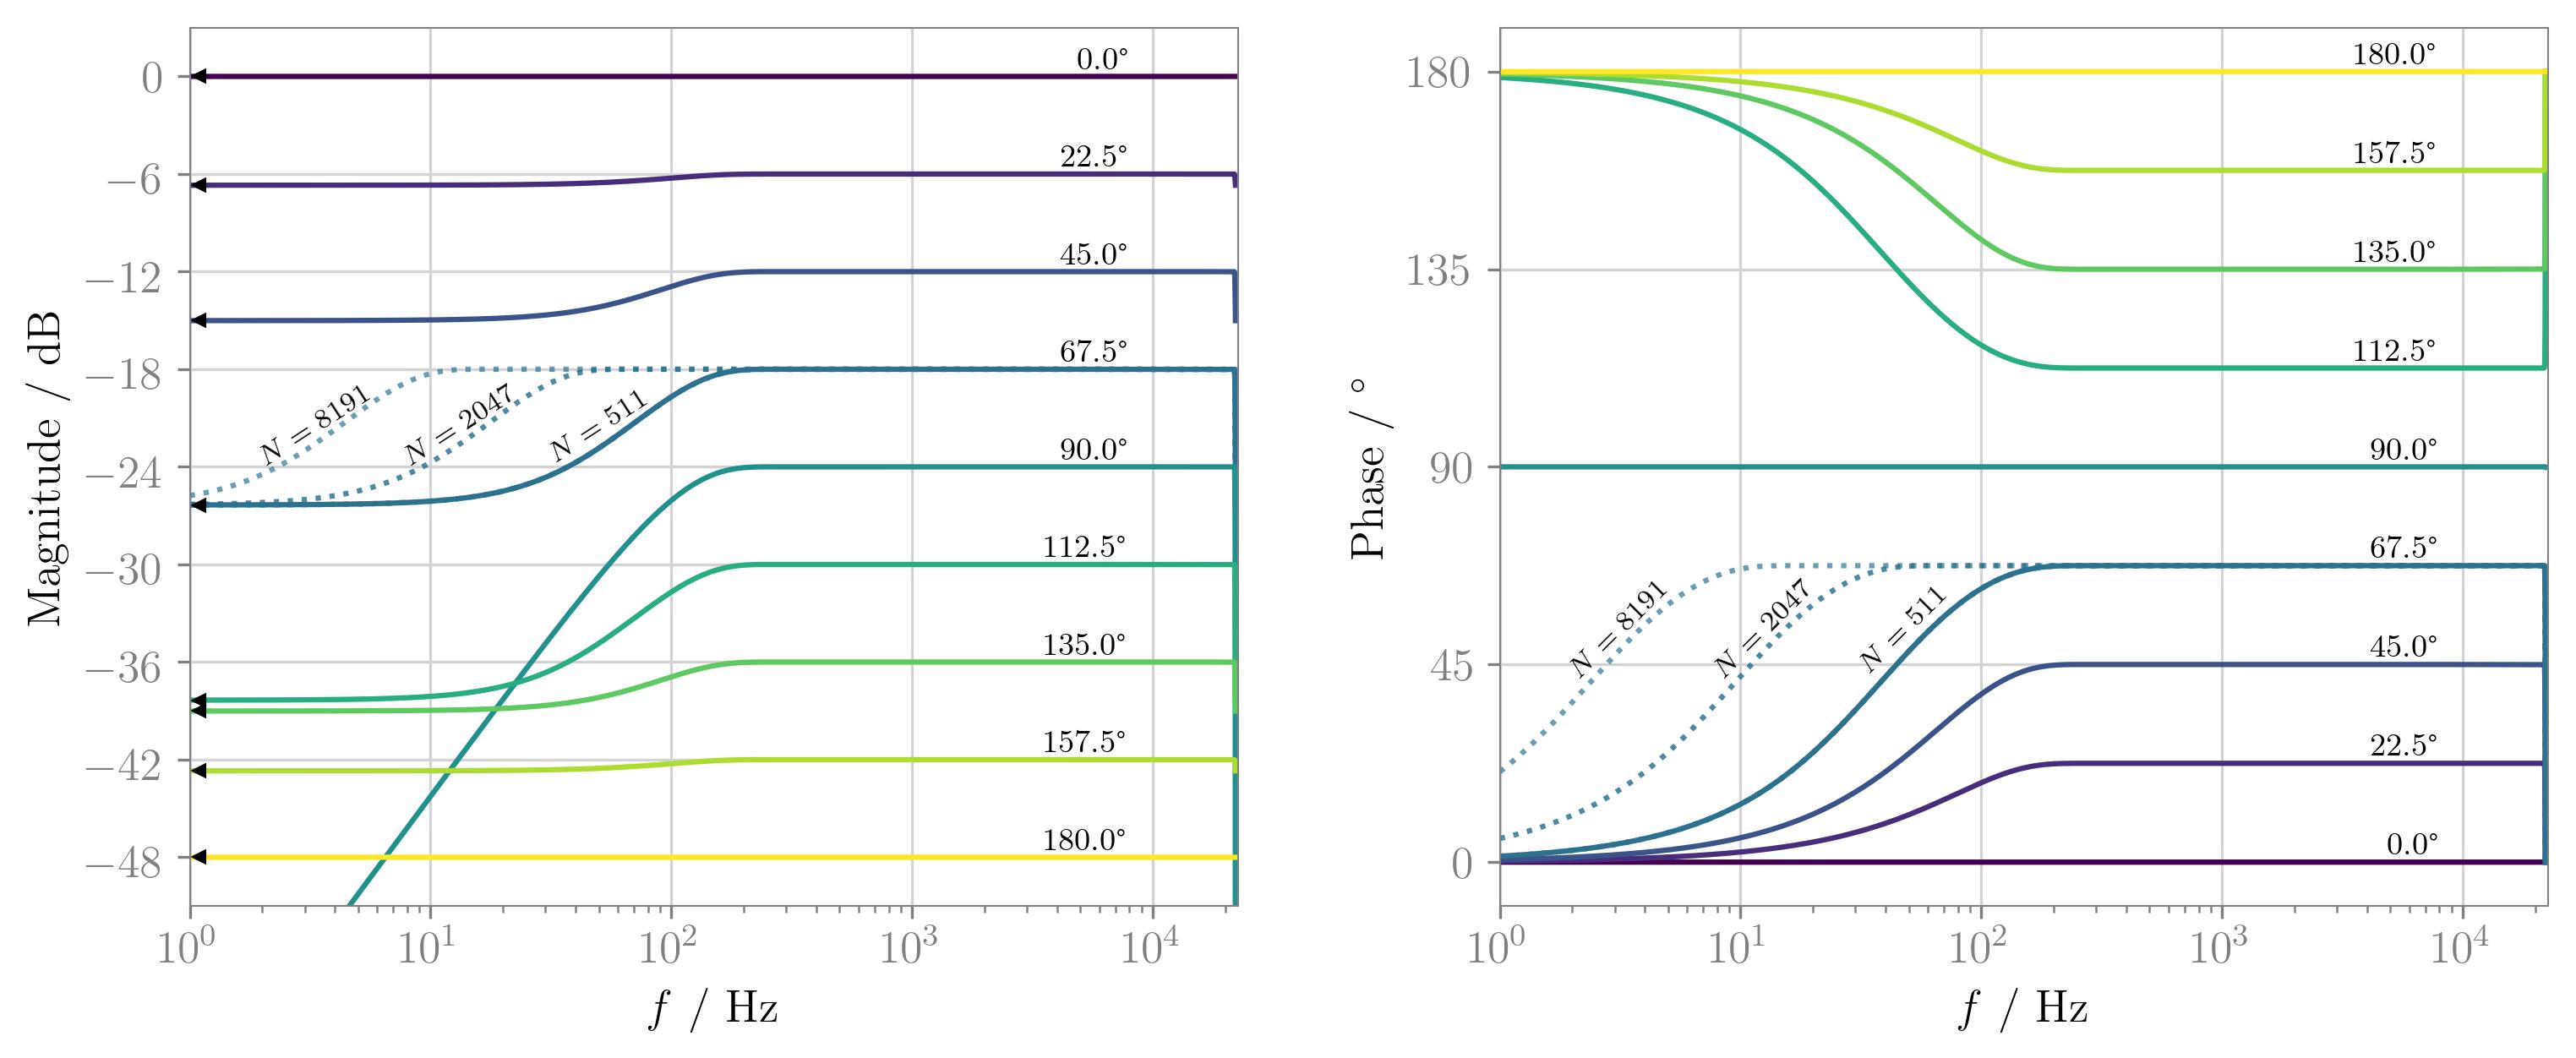 spatialaudio net   Research Trends in Spatial Audio